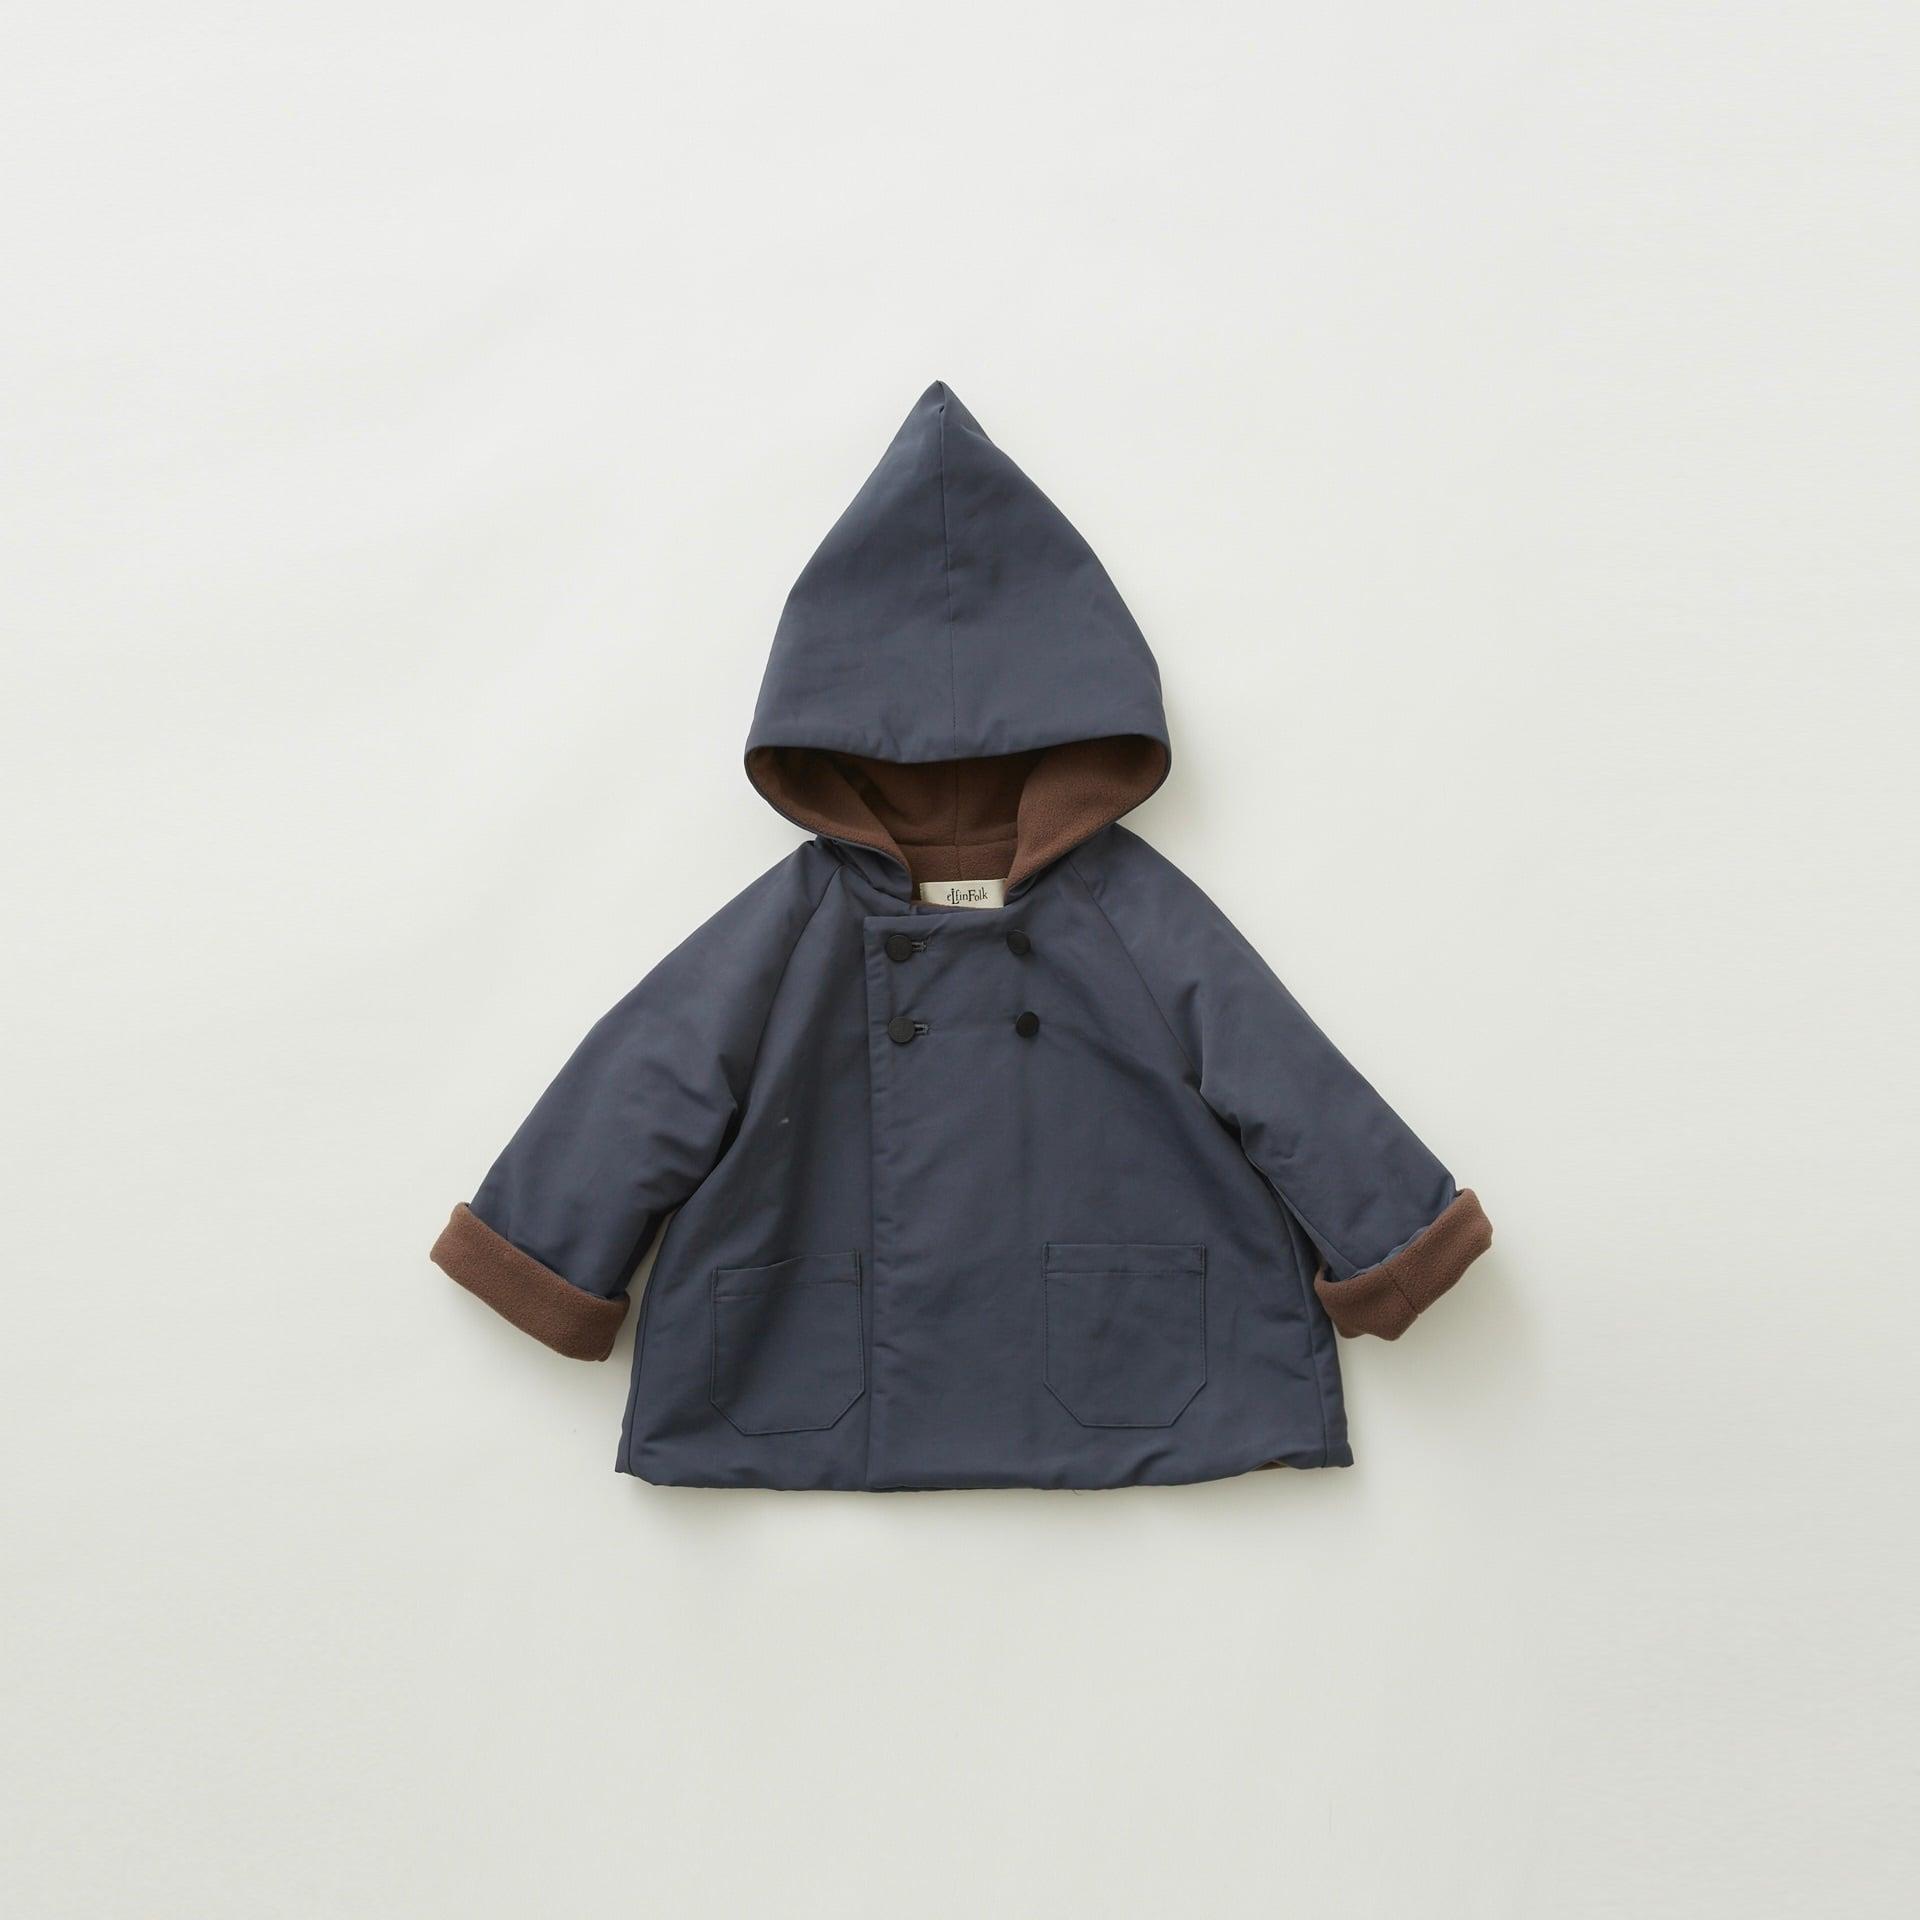 《eLfinFolk 2021AW》elf coat / blue gray / 110-130cm